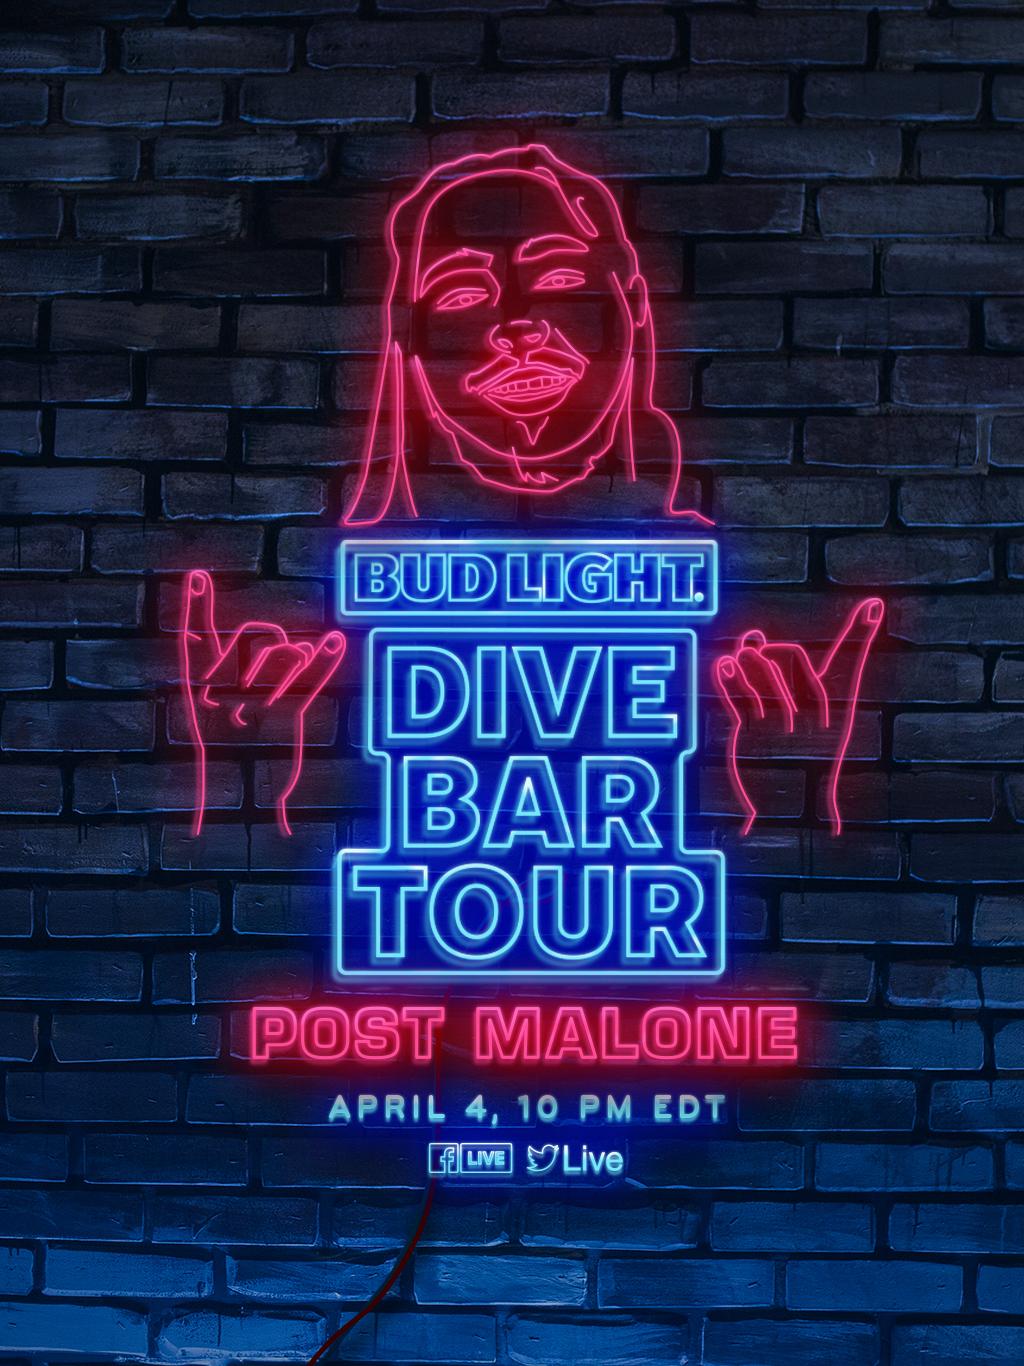 post malone bud light bar tour poster